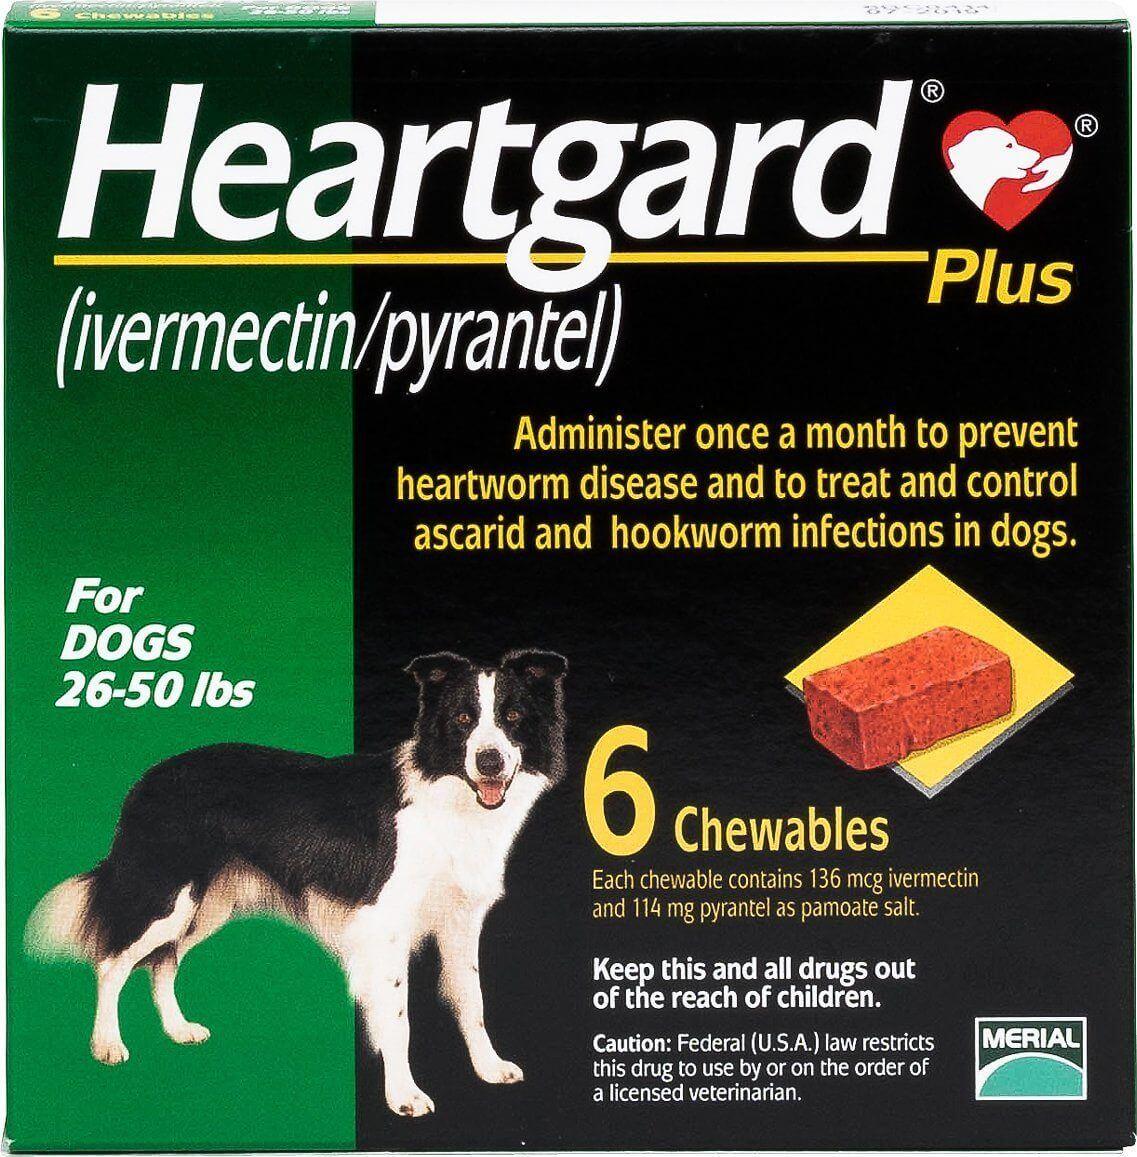 Heartgard Plus Green Box